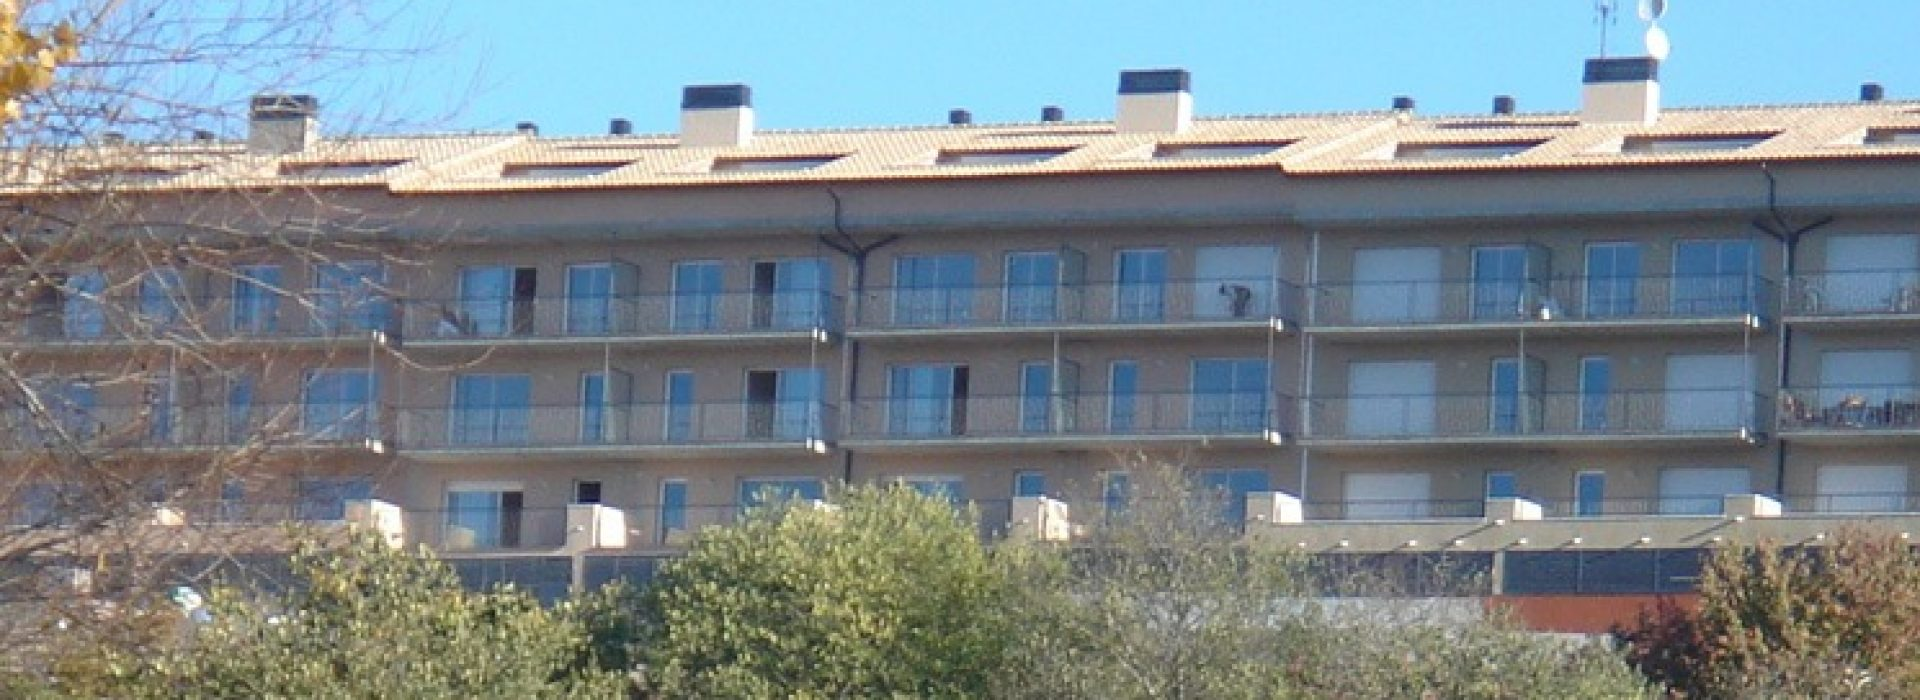 talarn-residencial01